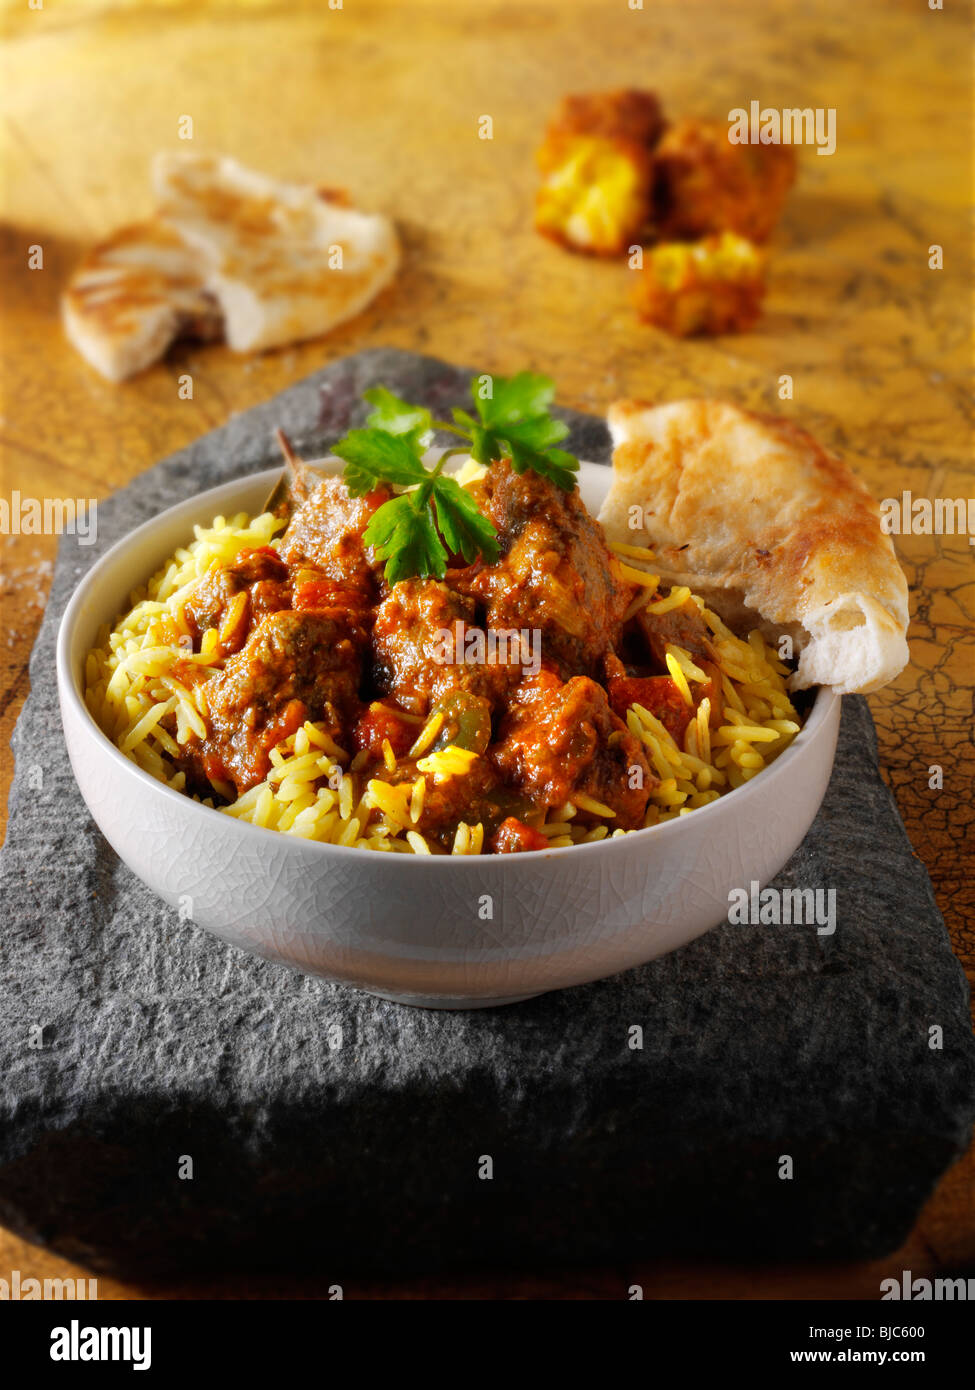 Lamb bhuna curry indian food stock photos stock photo 28542304 alamy lamb bhuna curry indian food stock photos forumfinder Gallery